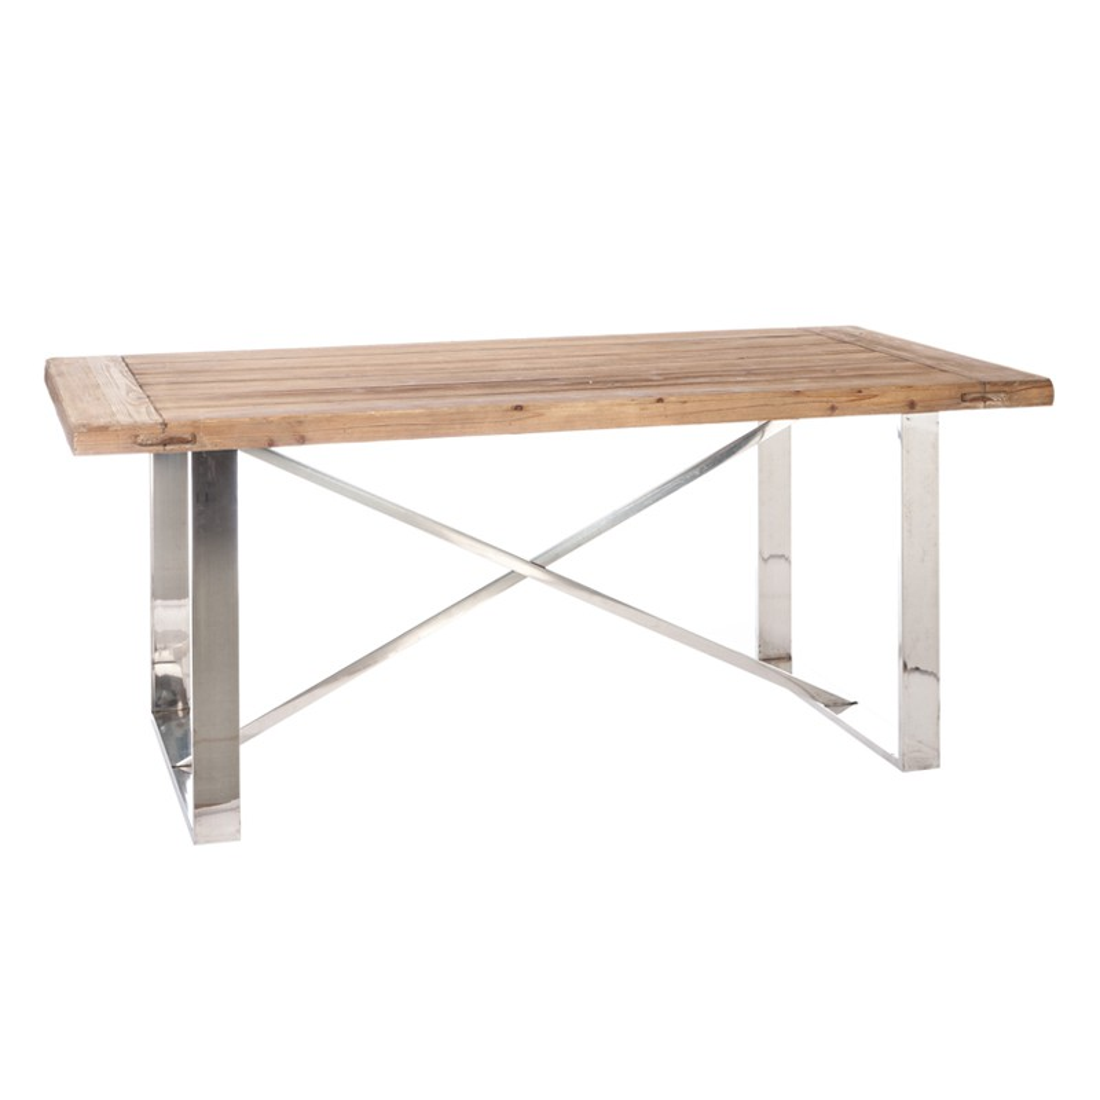 table de repas bois naturel et m tal brillant beny univers salle manger. Black Bedroom Furniture Sets. Home Design Ideas